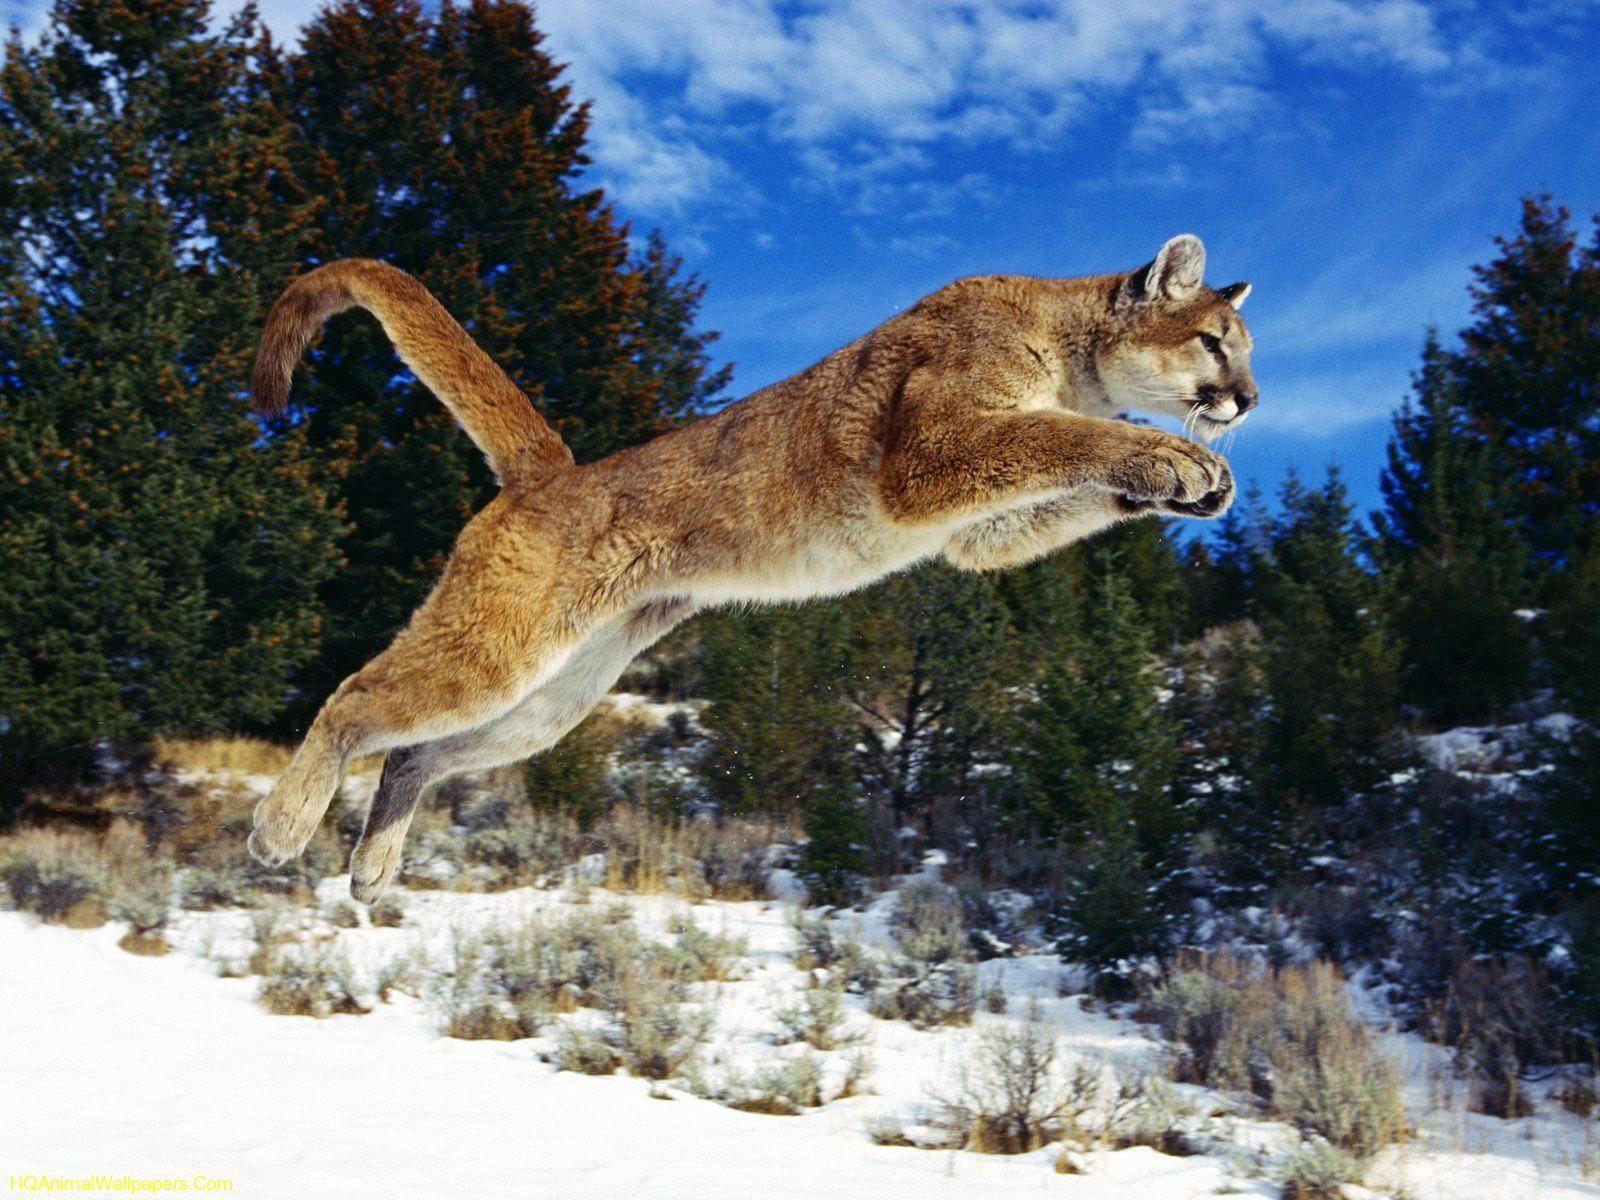 Download Free Desktop Background Wallpapers For Your Mobile über Tierbilder Download